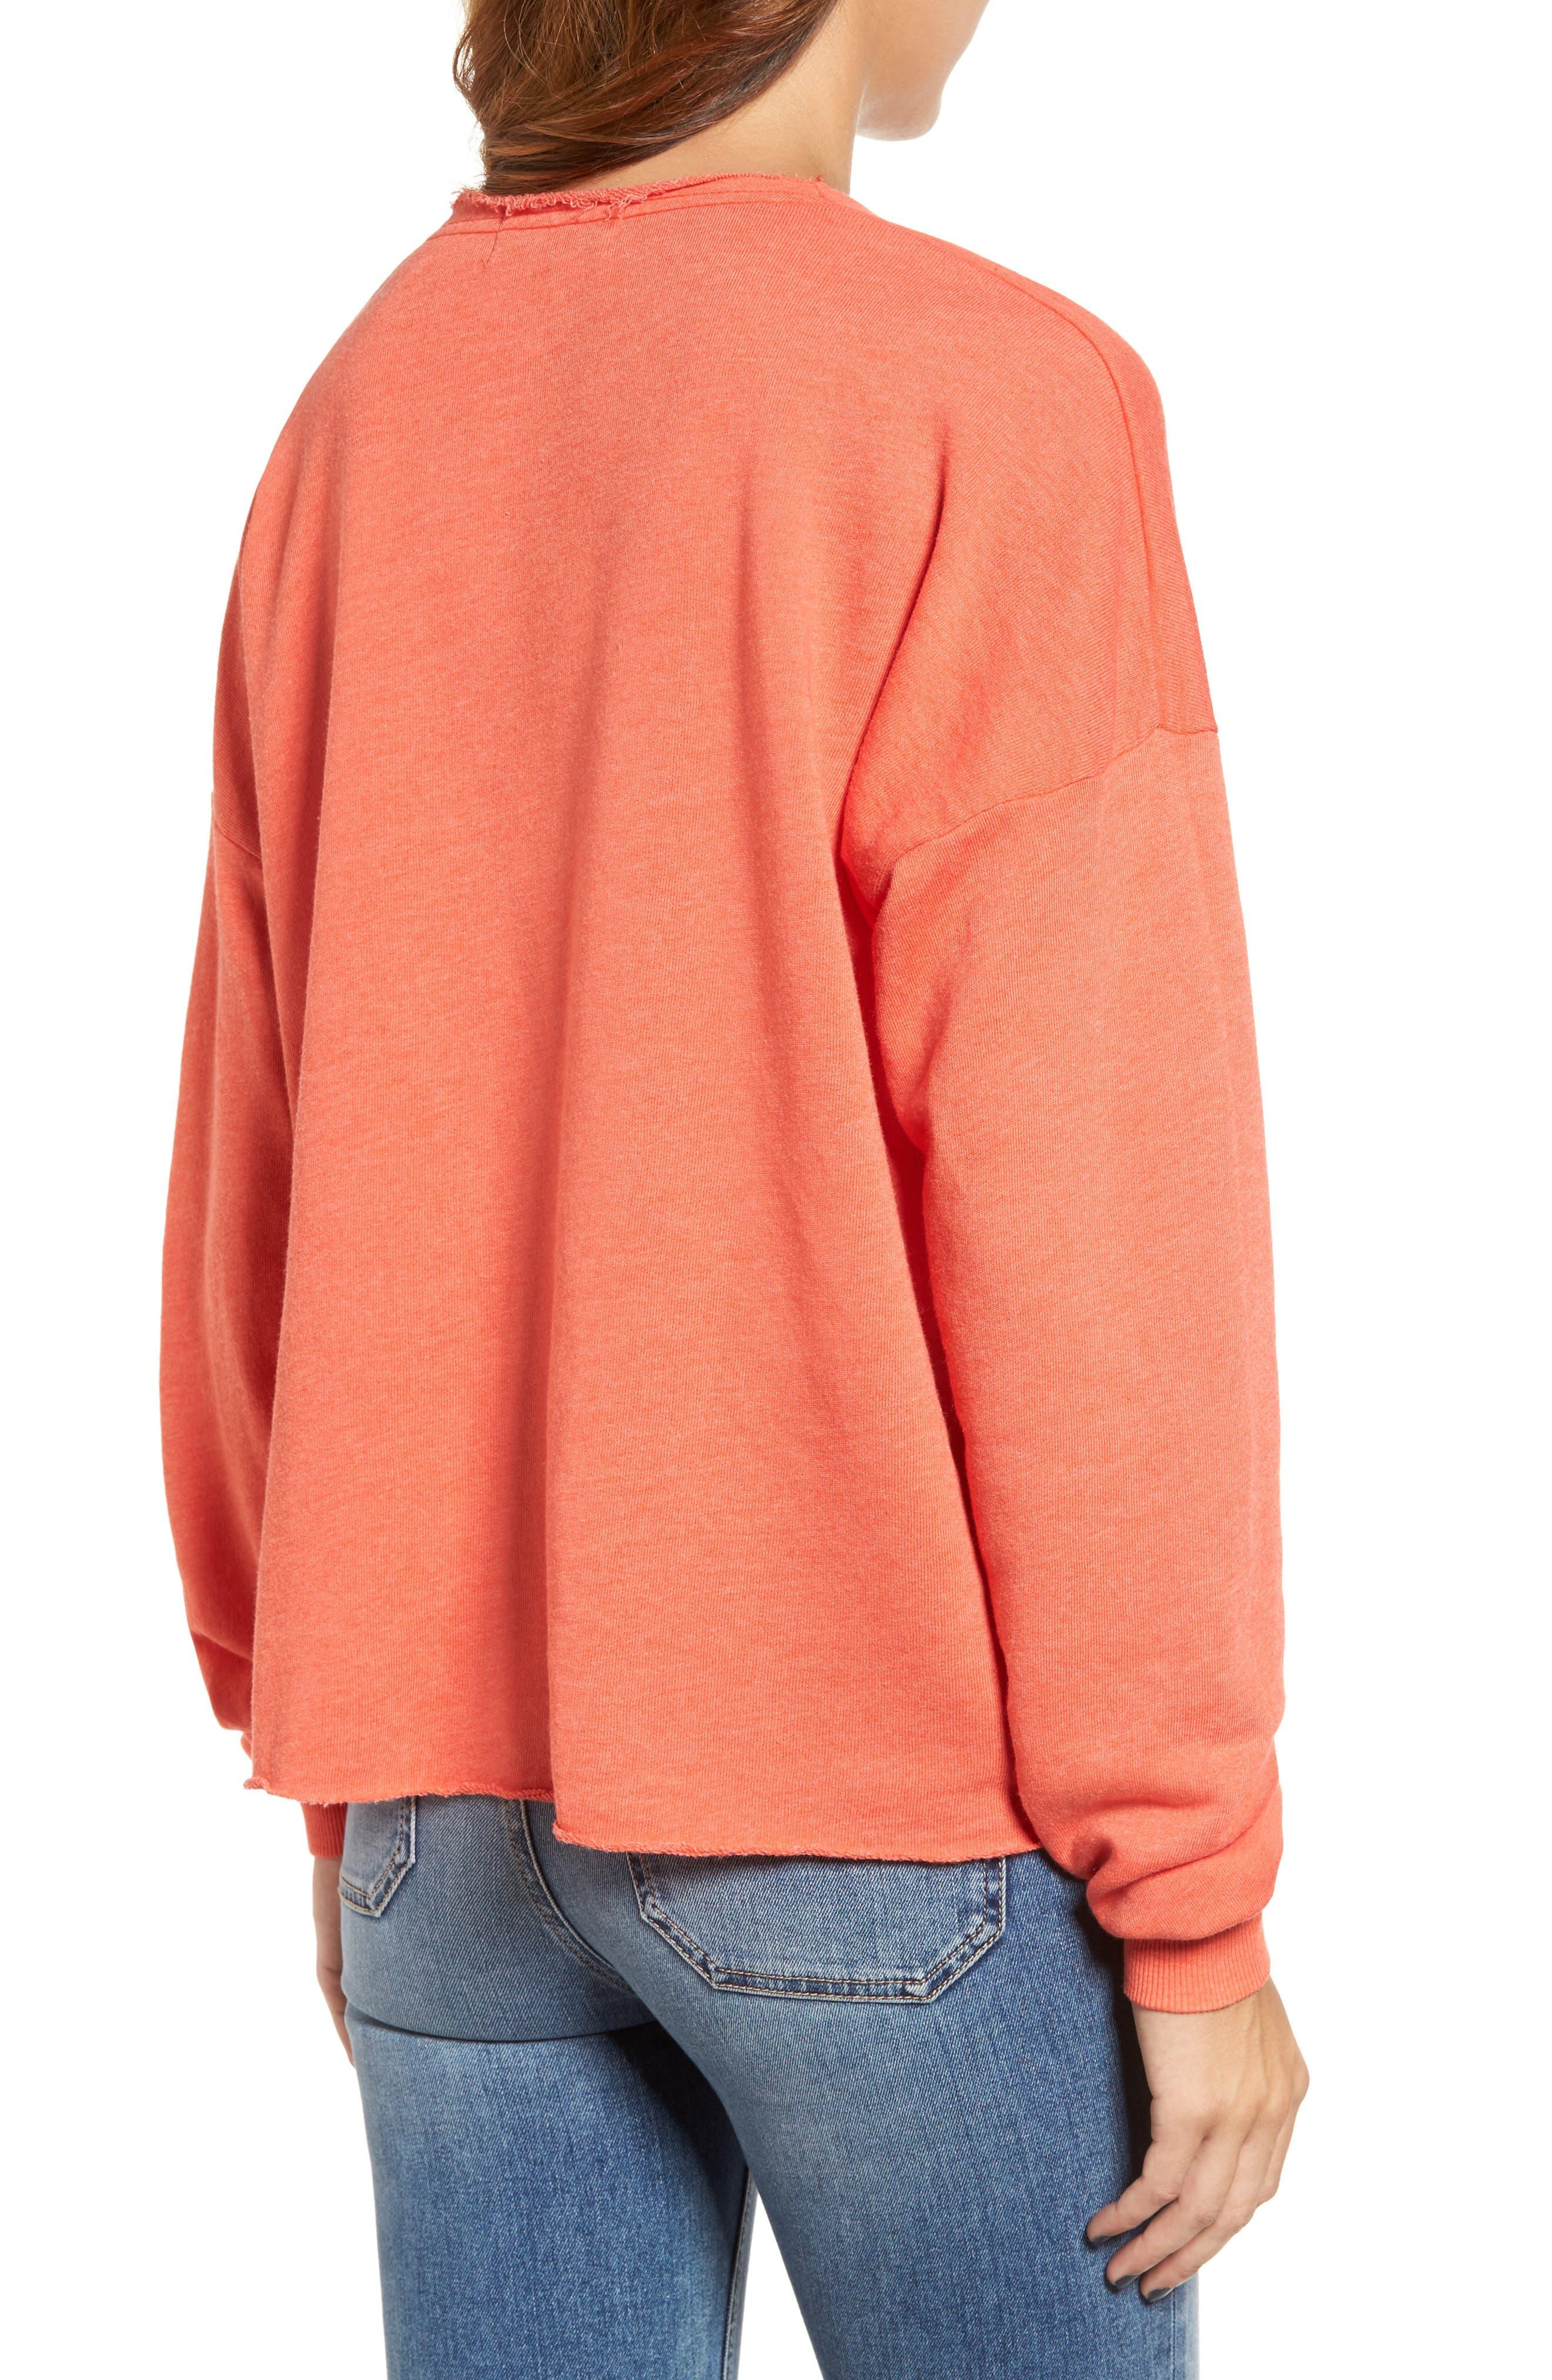 Love 24/7 Sweatshirt,                             Alternate thumbnail 2, color,                             640